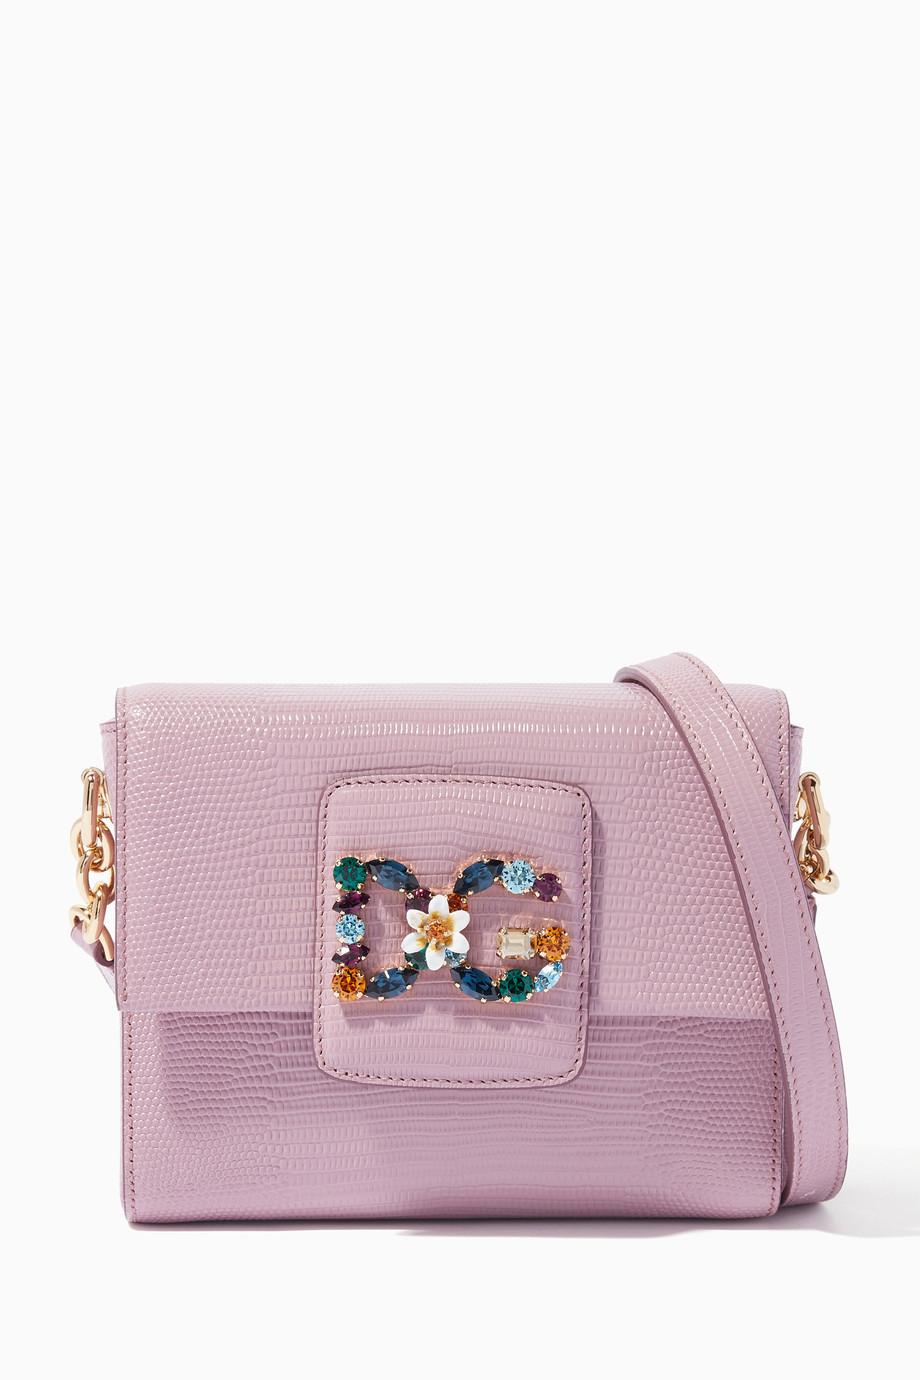 4e09e0c36d9 Shop Dolce & Gabbana Pink Powder-Pink Mini Iguana-Embossed ...